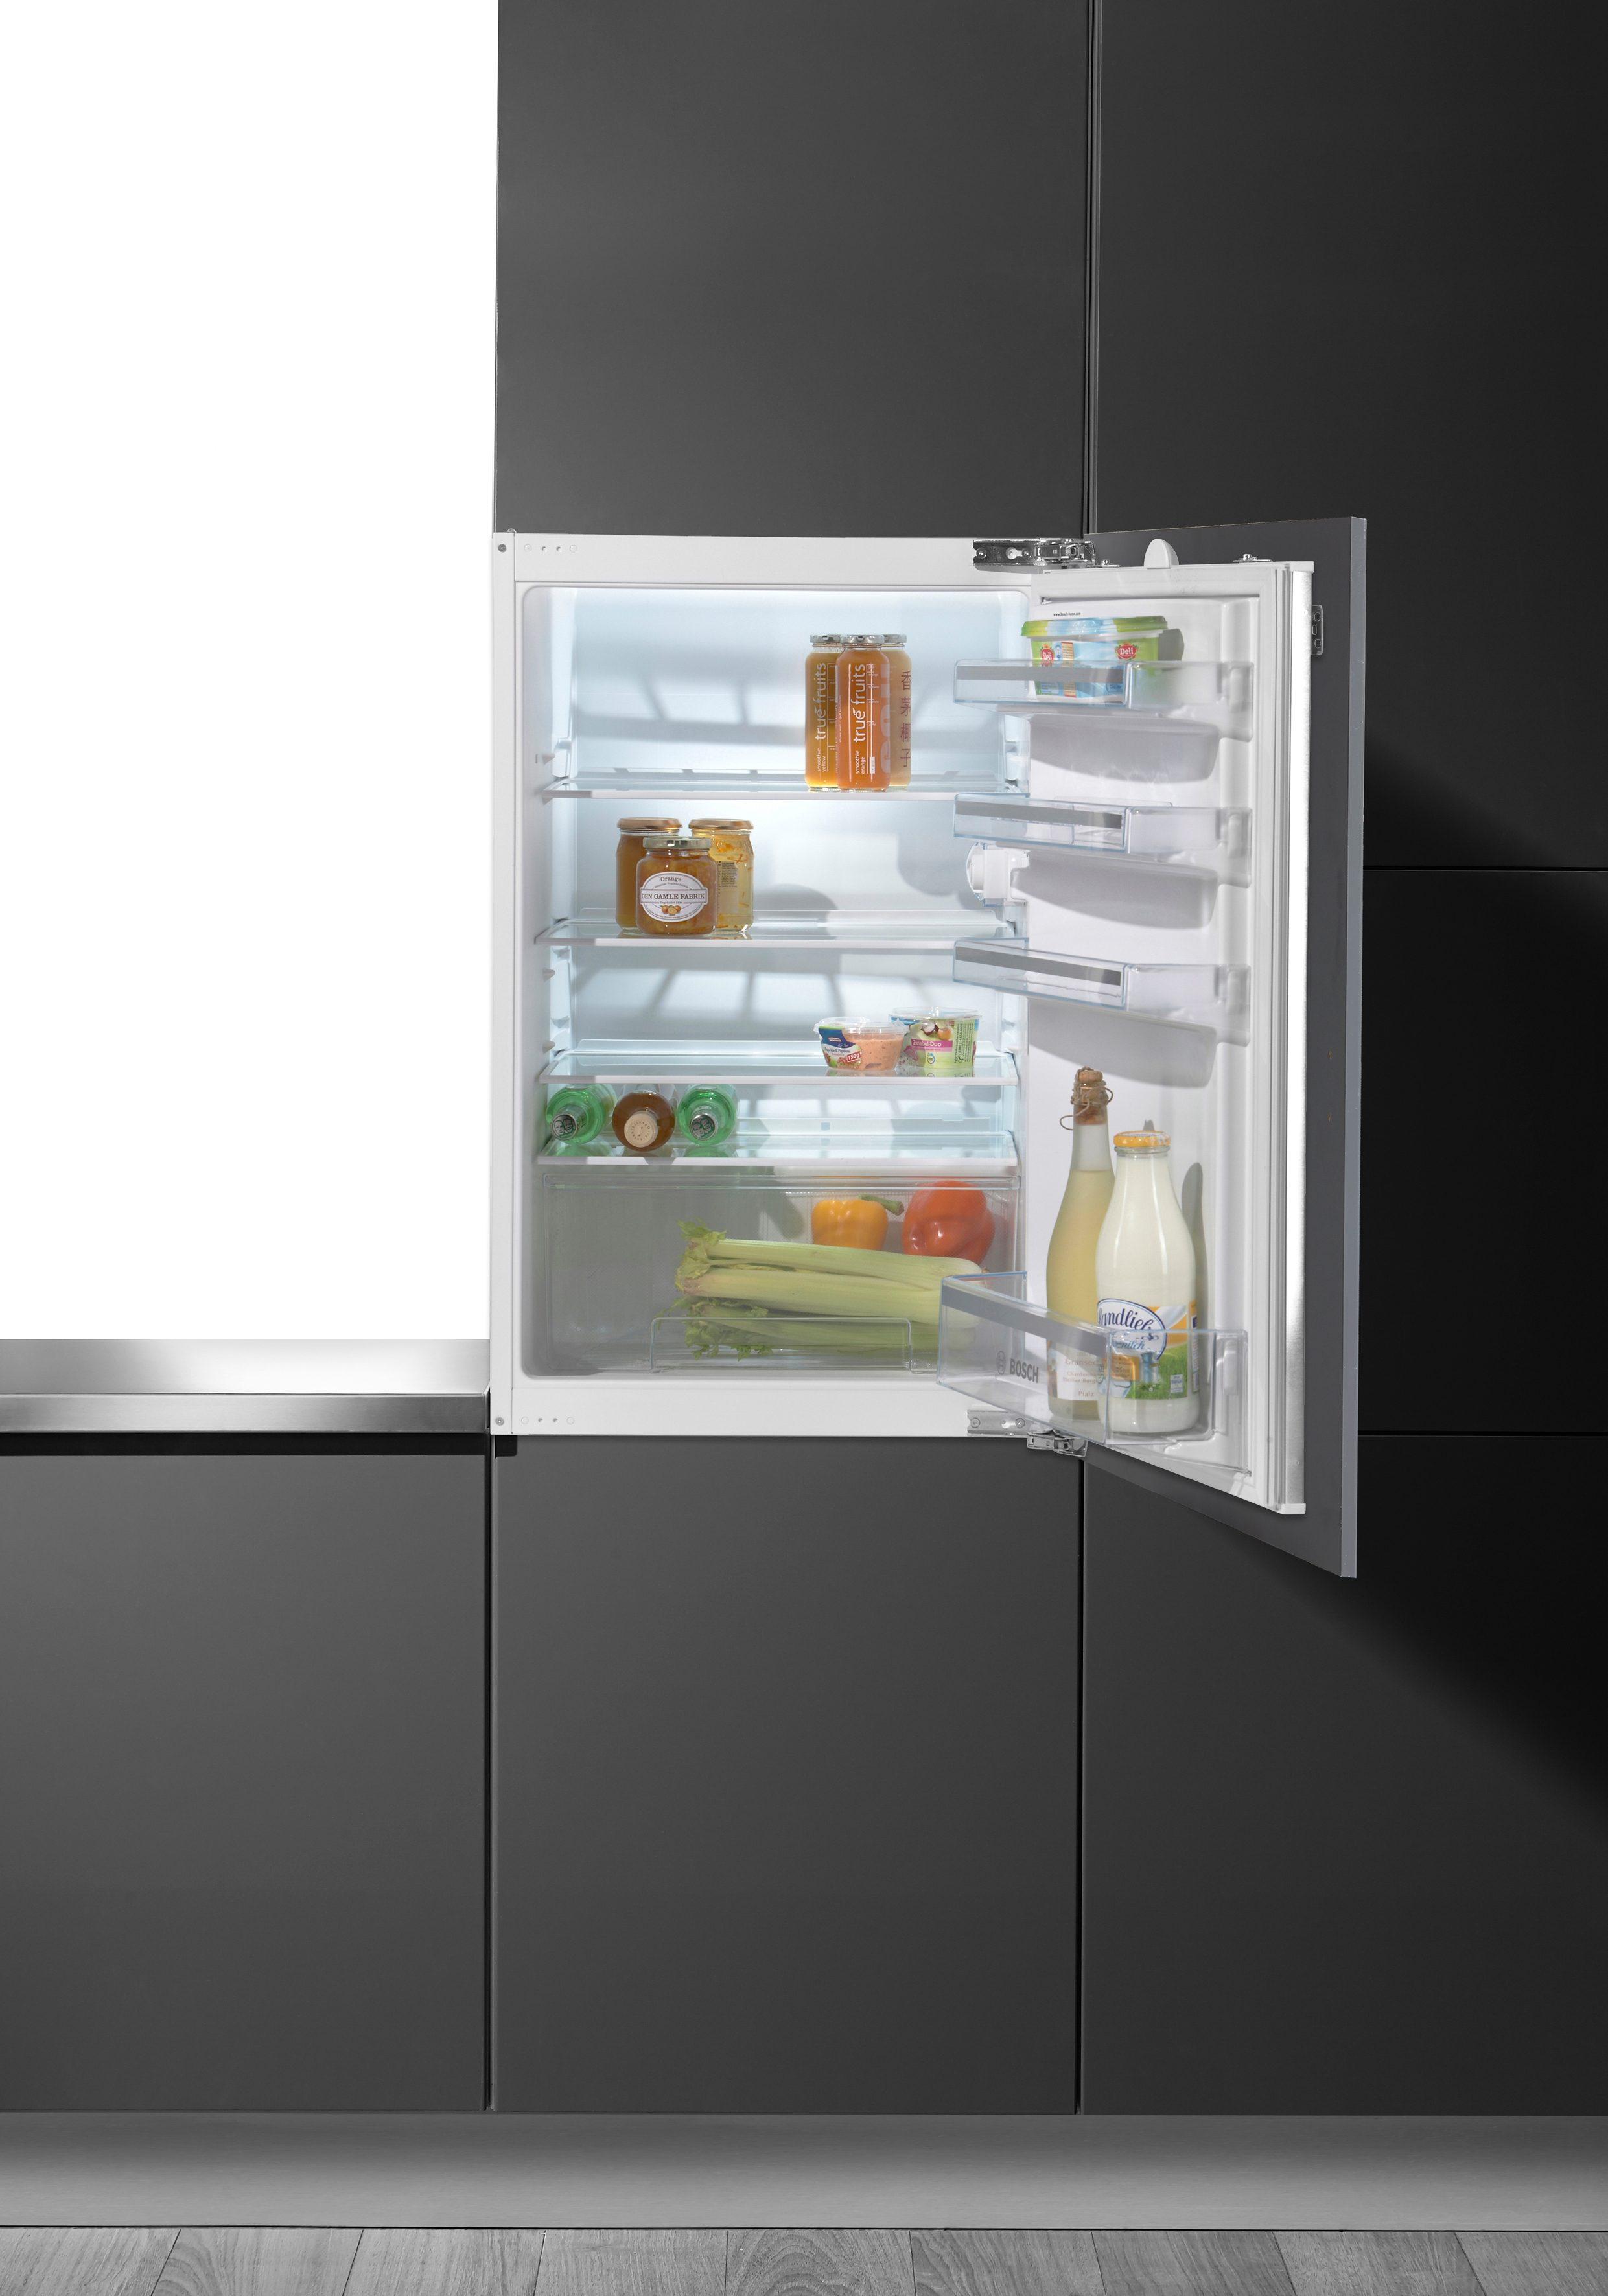 Bosch integrierbarer Einbau-Kühlschrank KIR18V60, A++, 88 cm